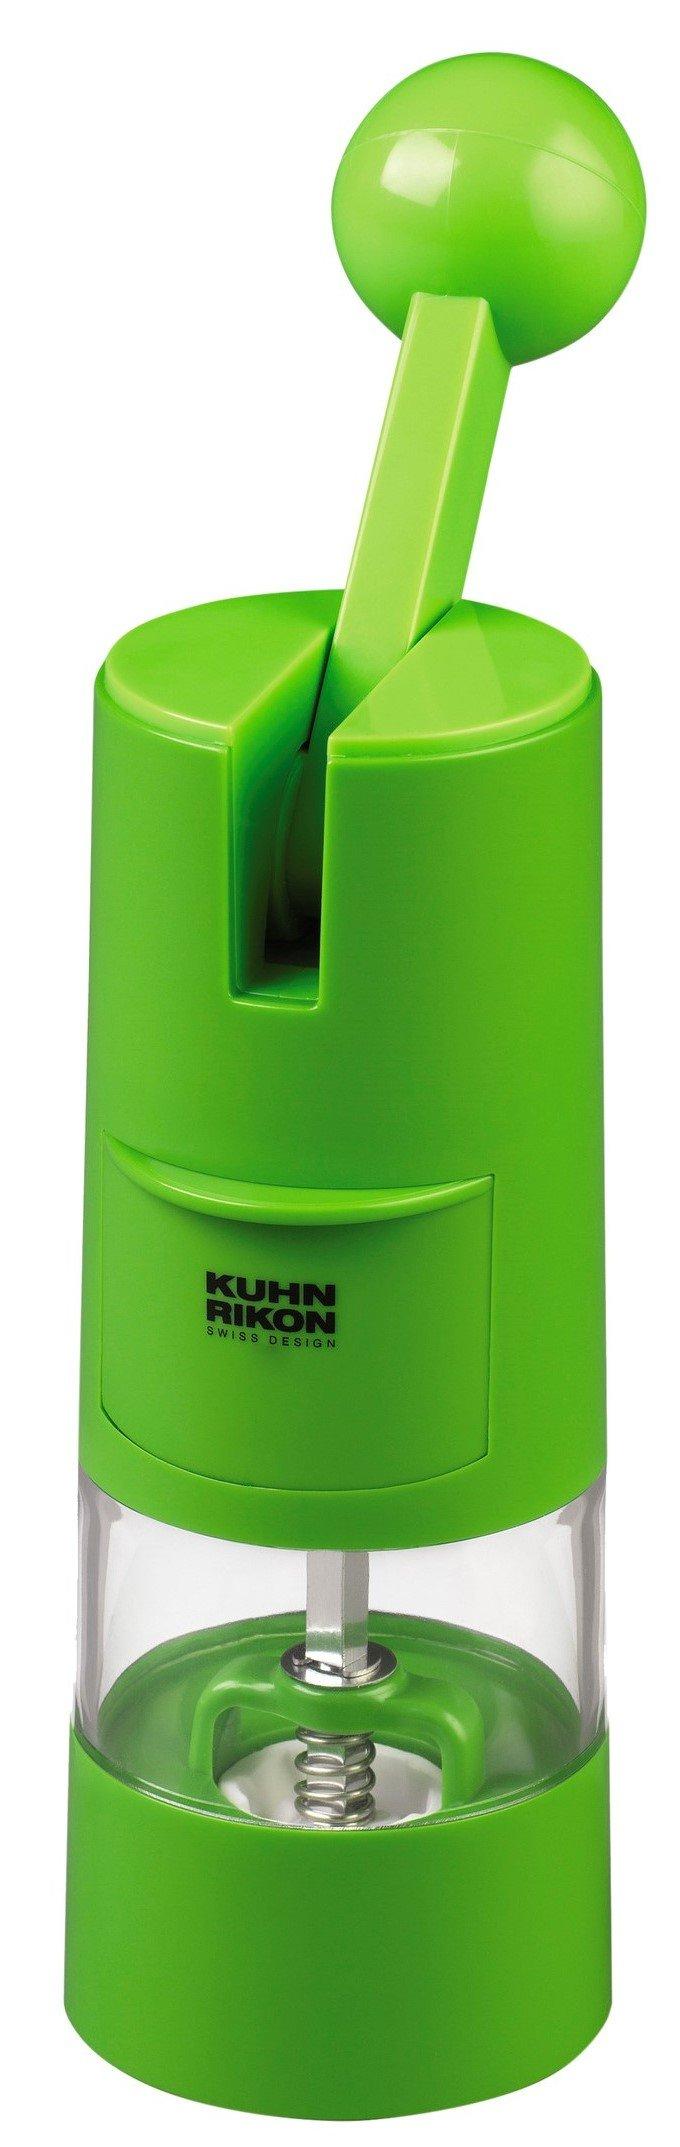 Kuhn Rikon High Performance Ratchet Grinder, Green